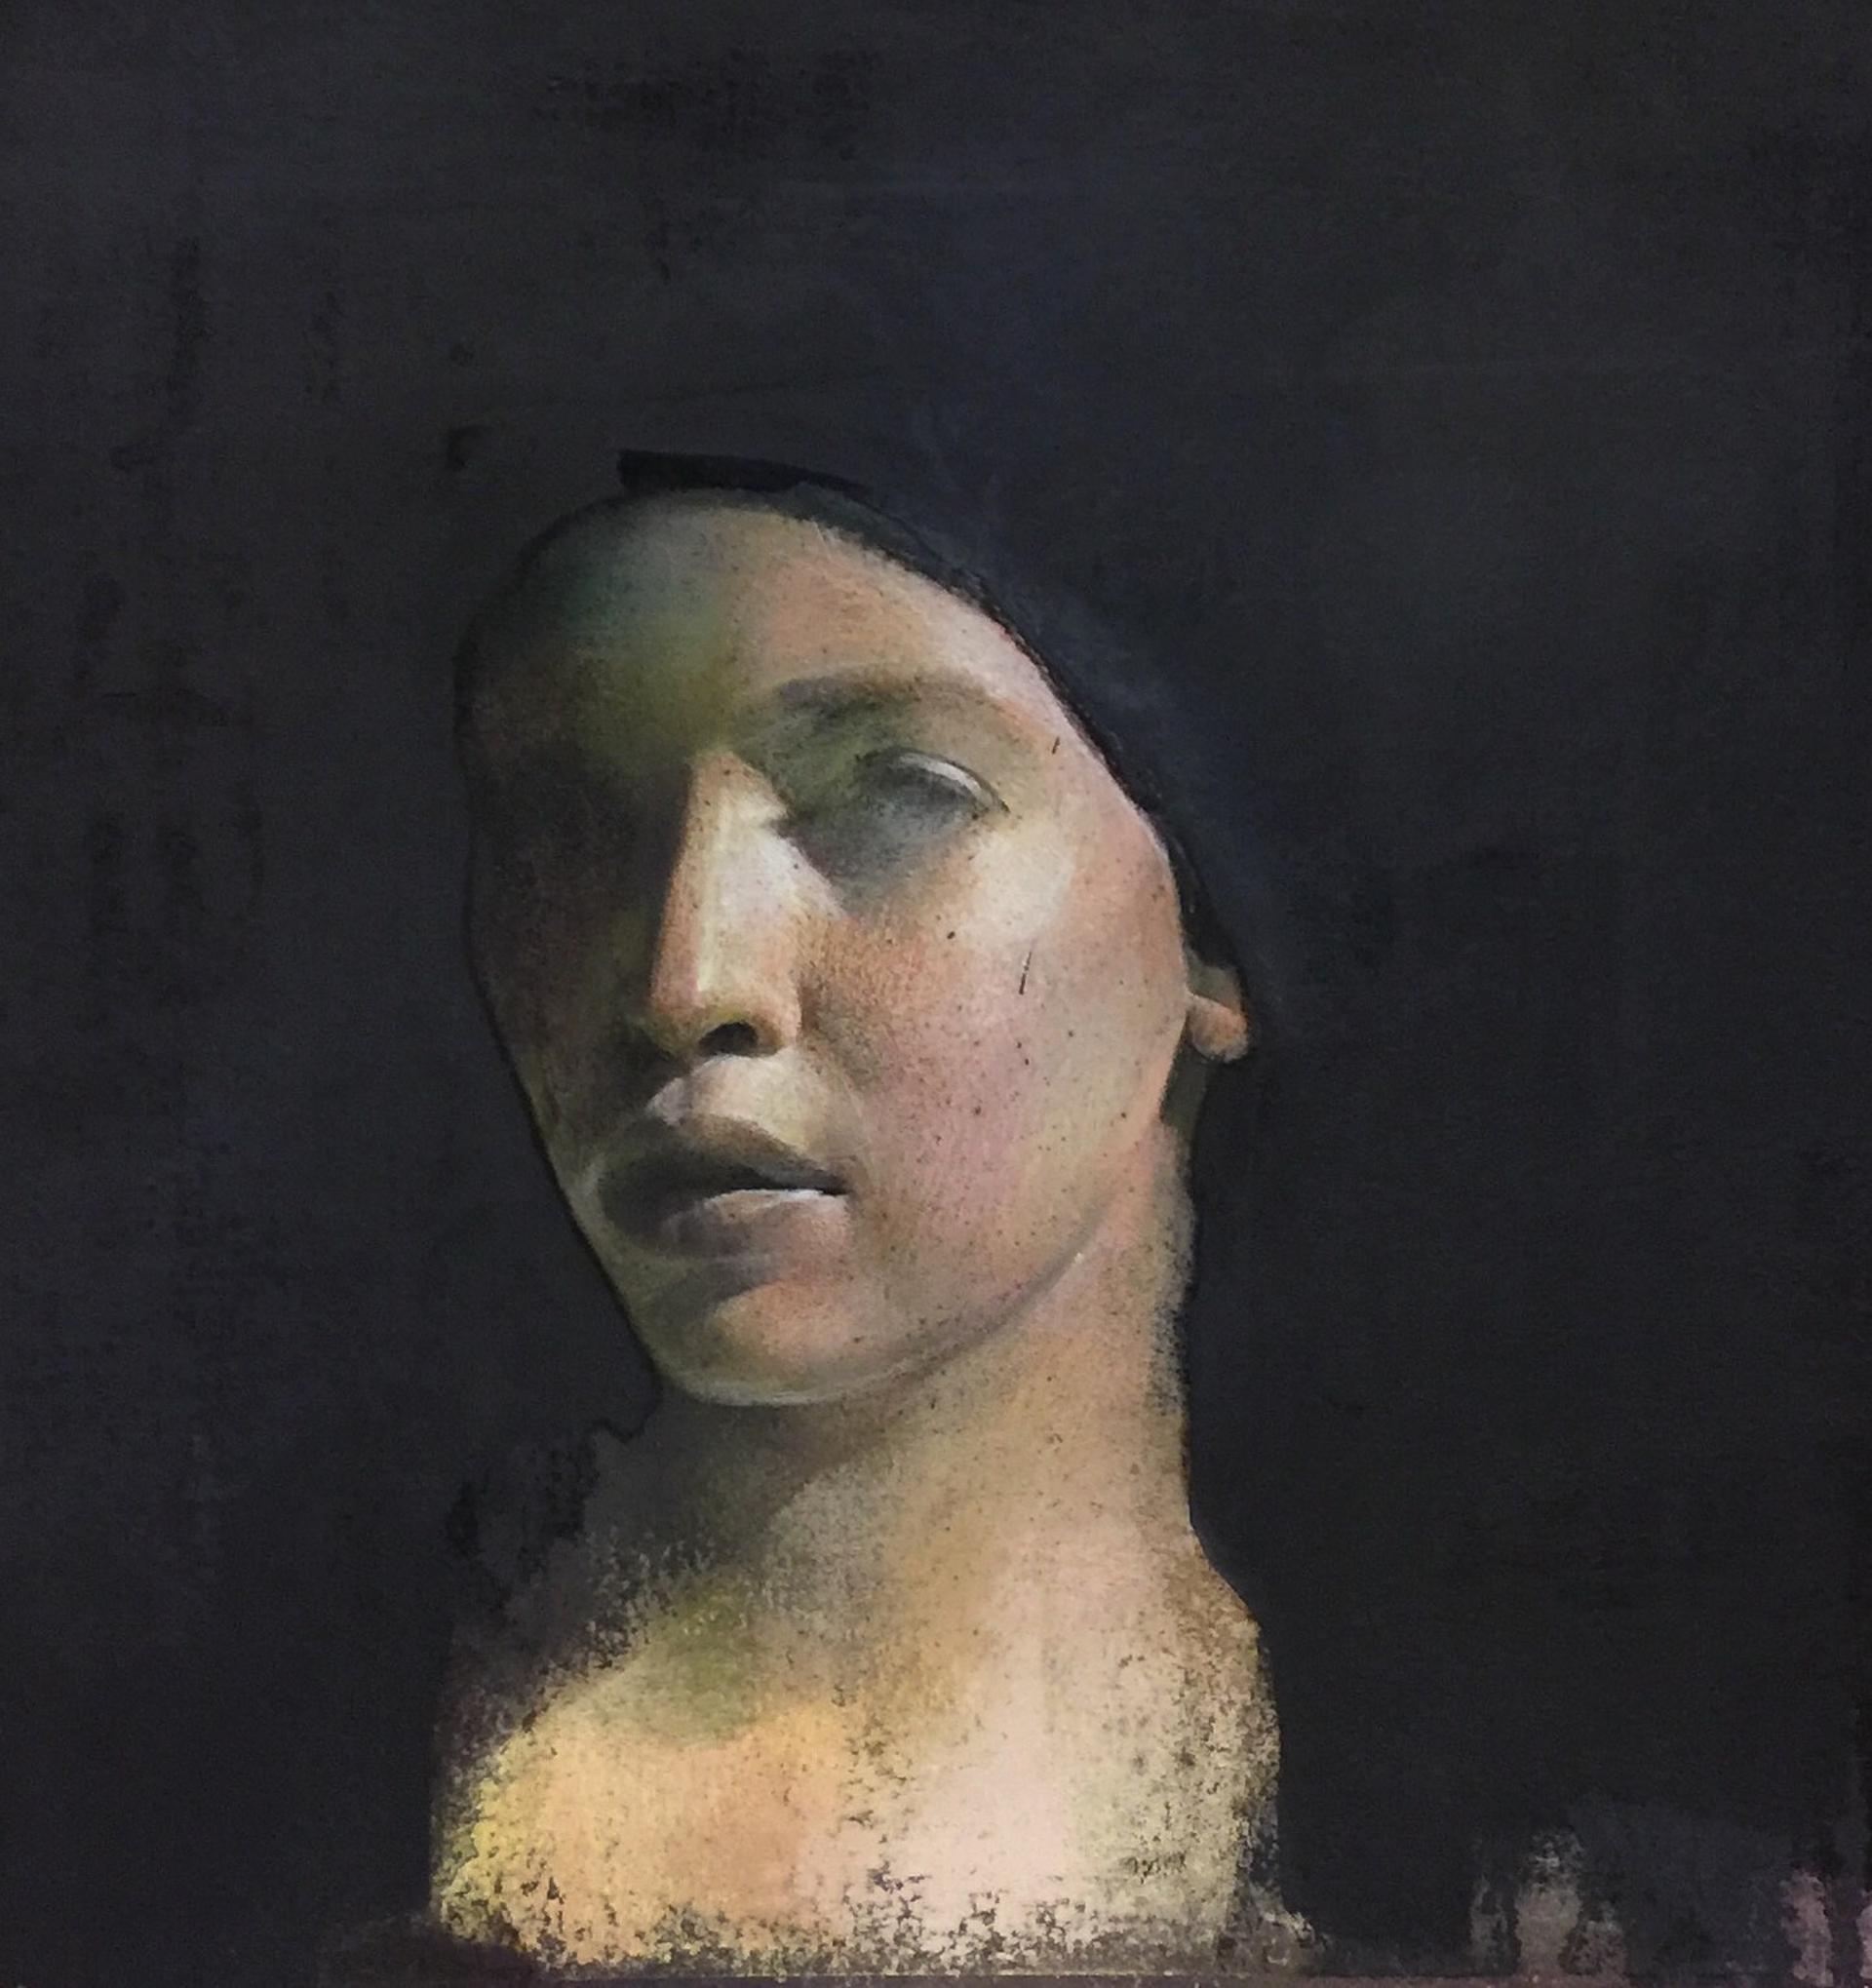 Head Study 2 by Yuriy Ibragimov